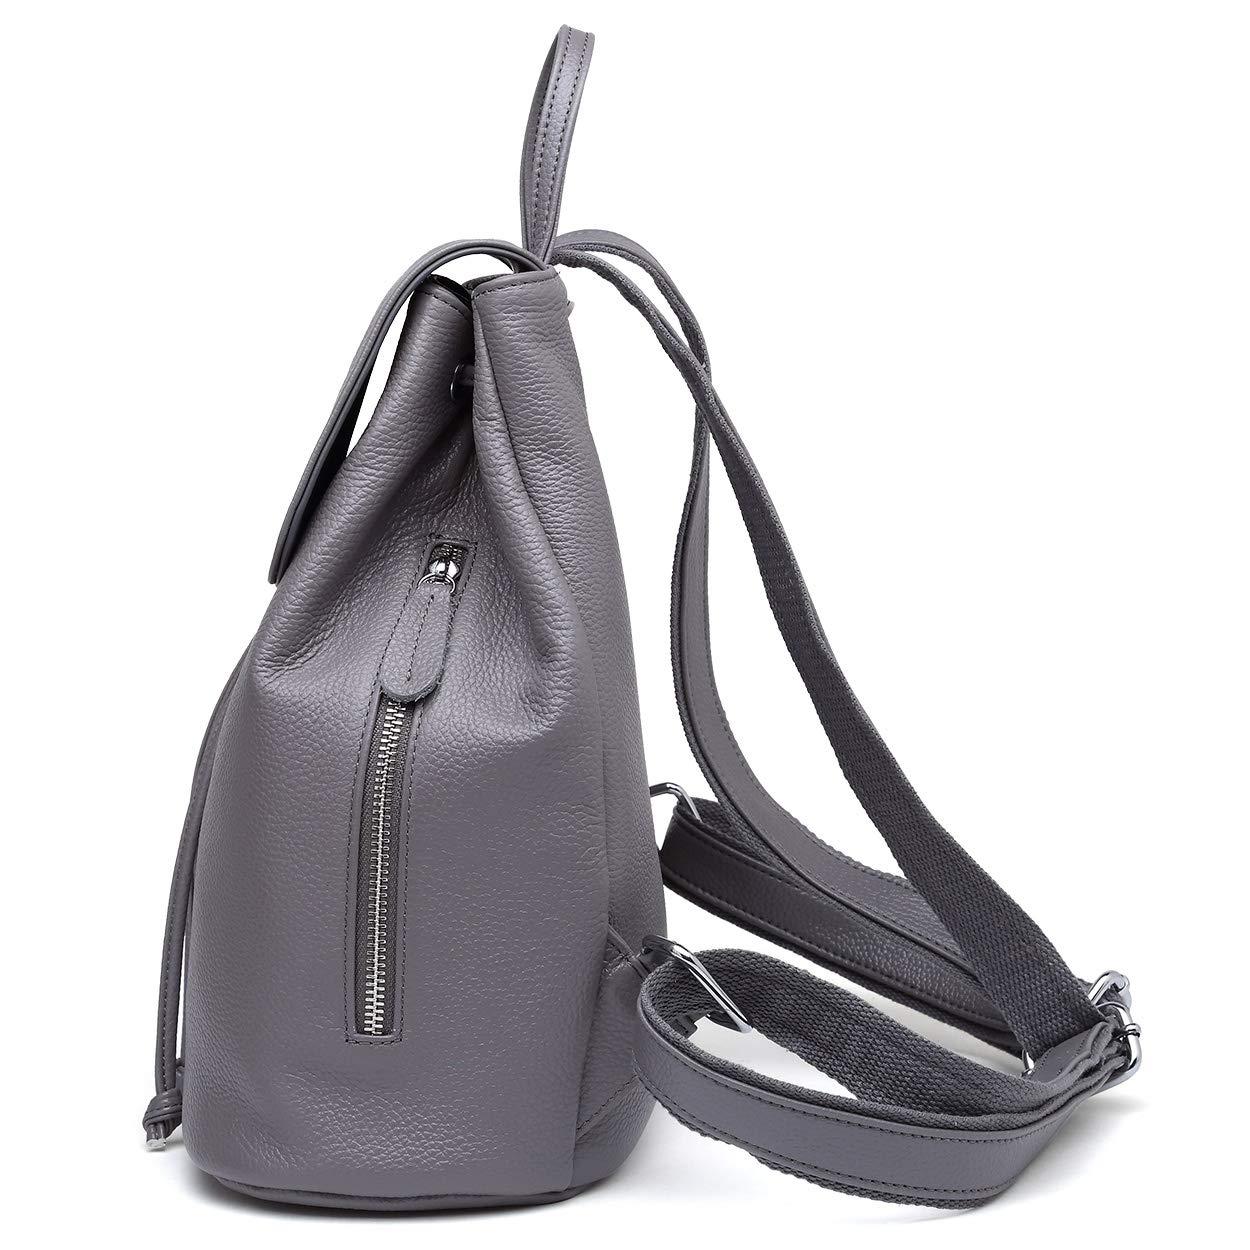 Dam äkta läder ryggsäck elegant ryggsäck söt skola axelväska kvinnor resväska Grå